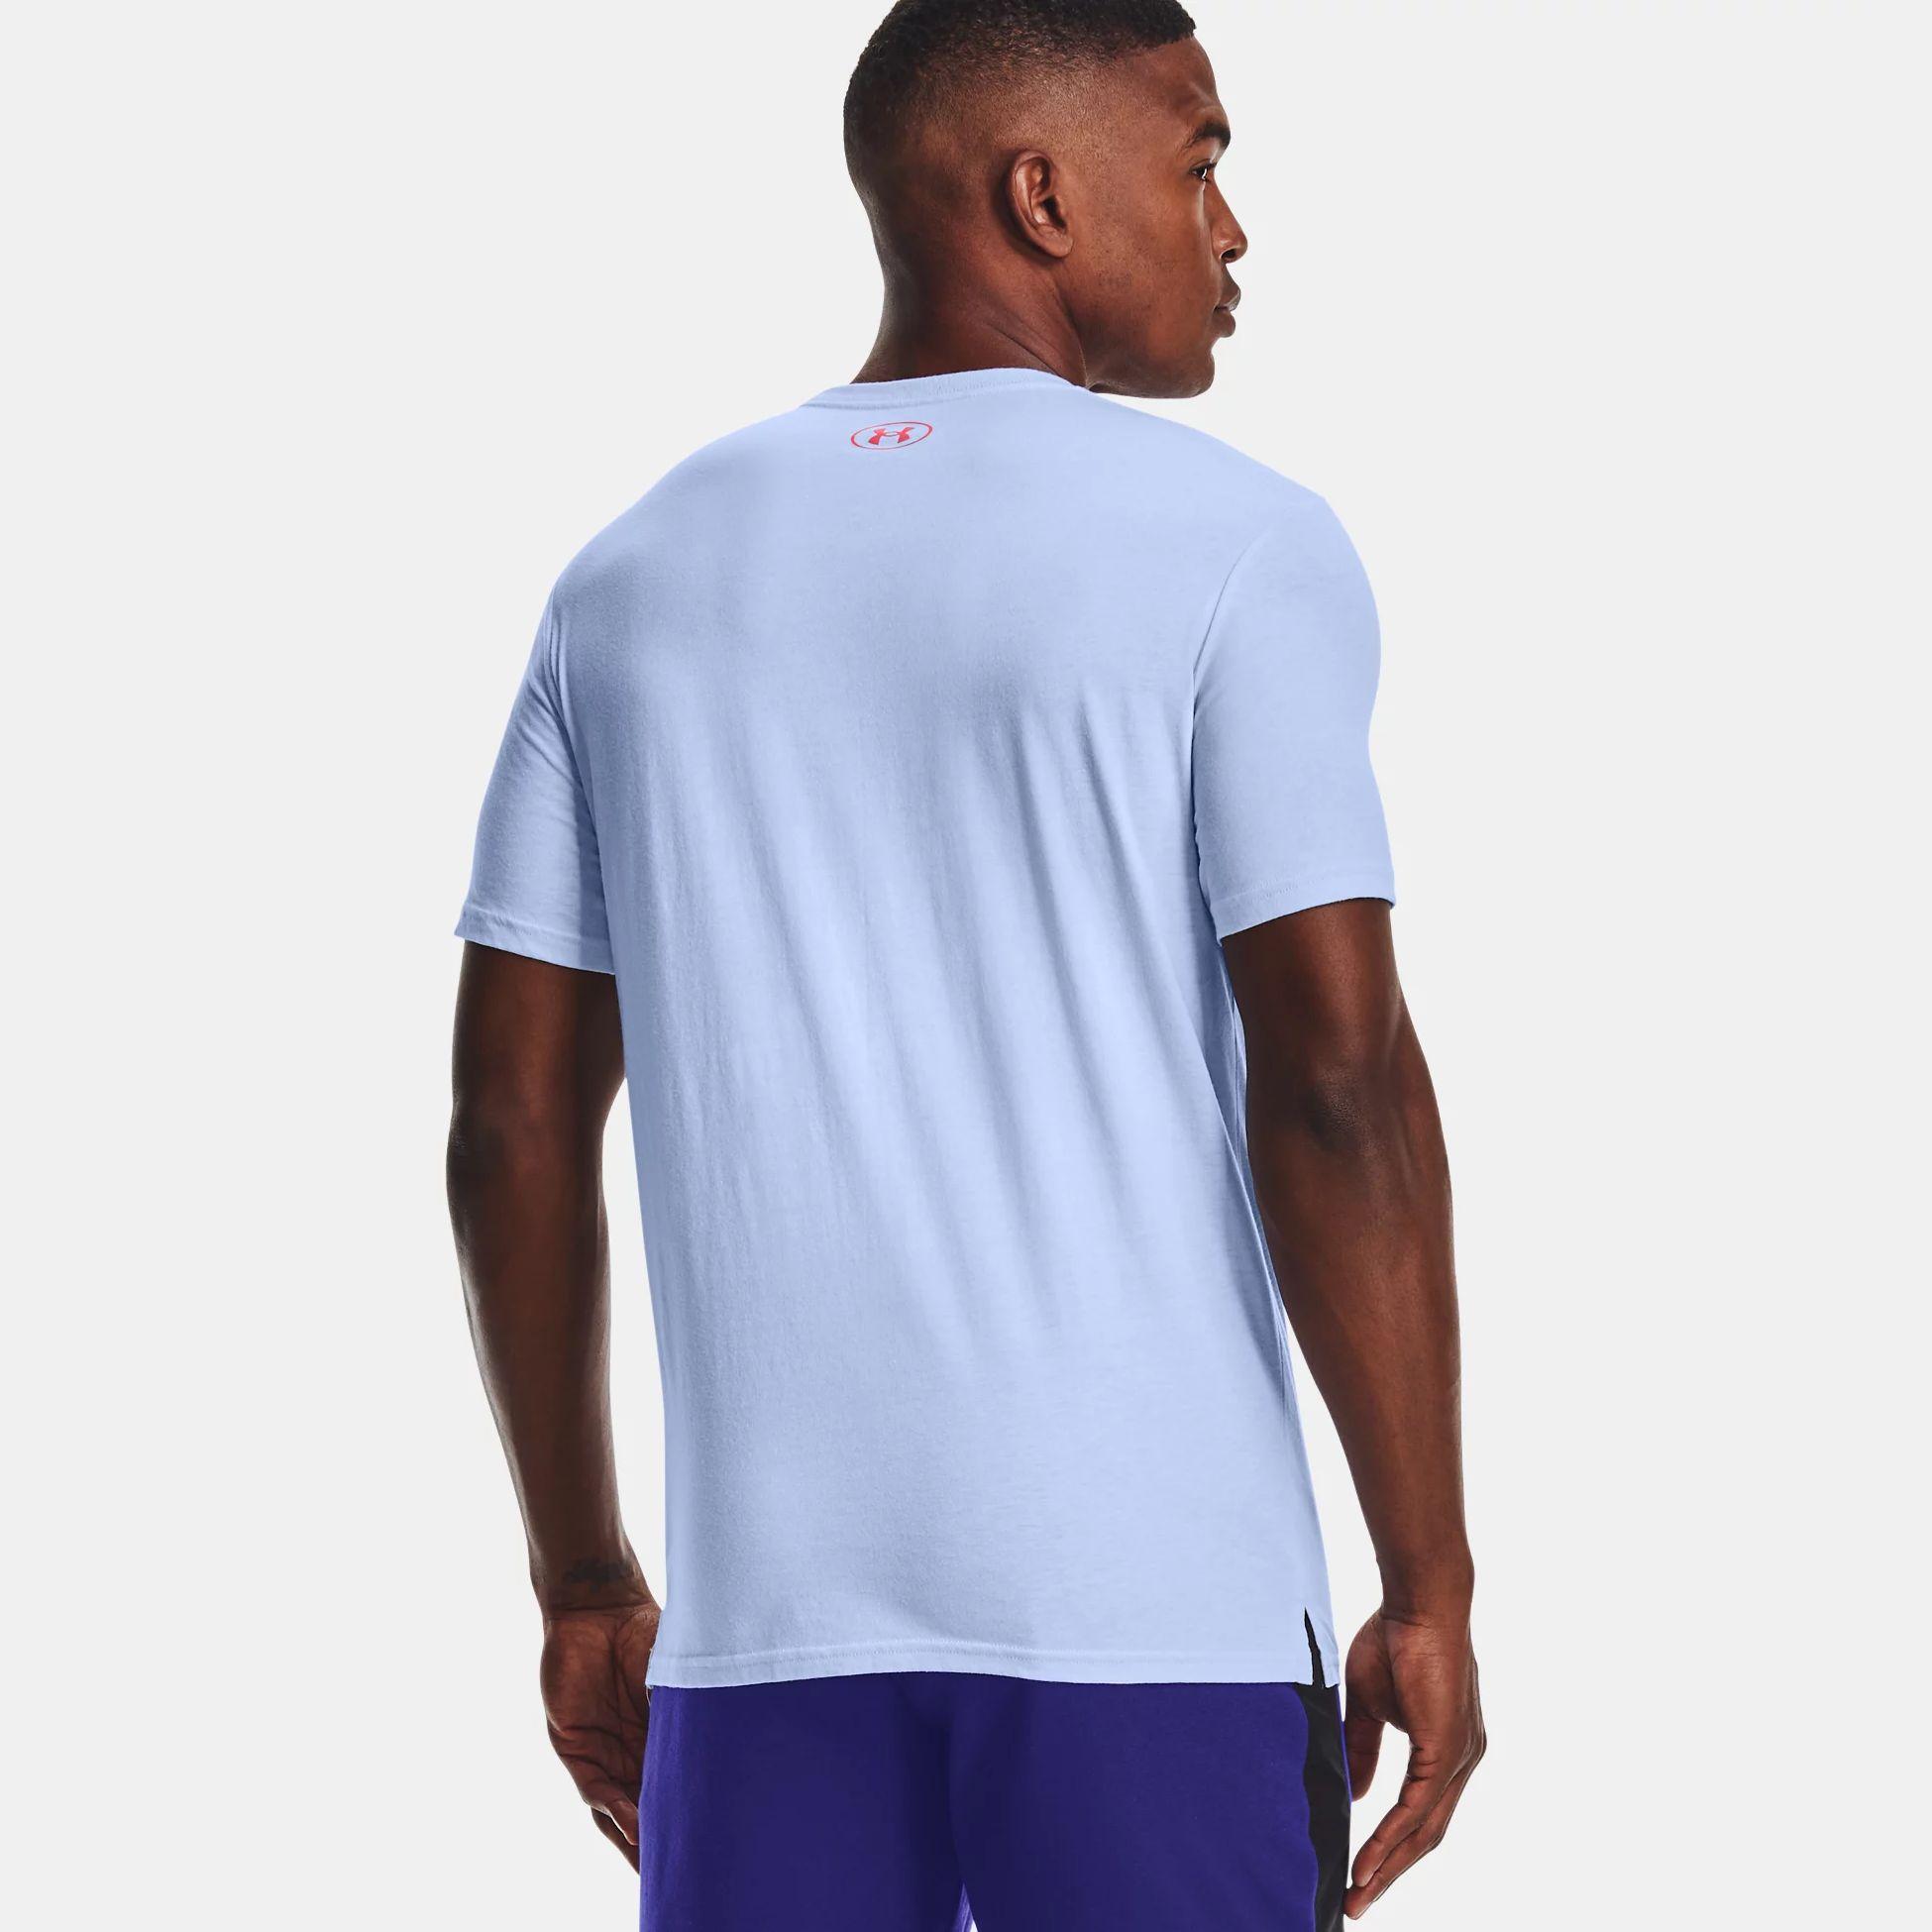 Clothing -  under armour Vertical Wordmark Short Sleeve